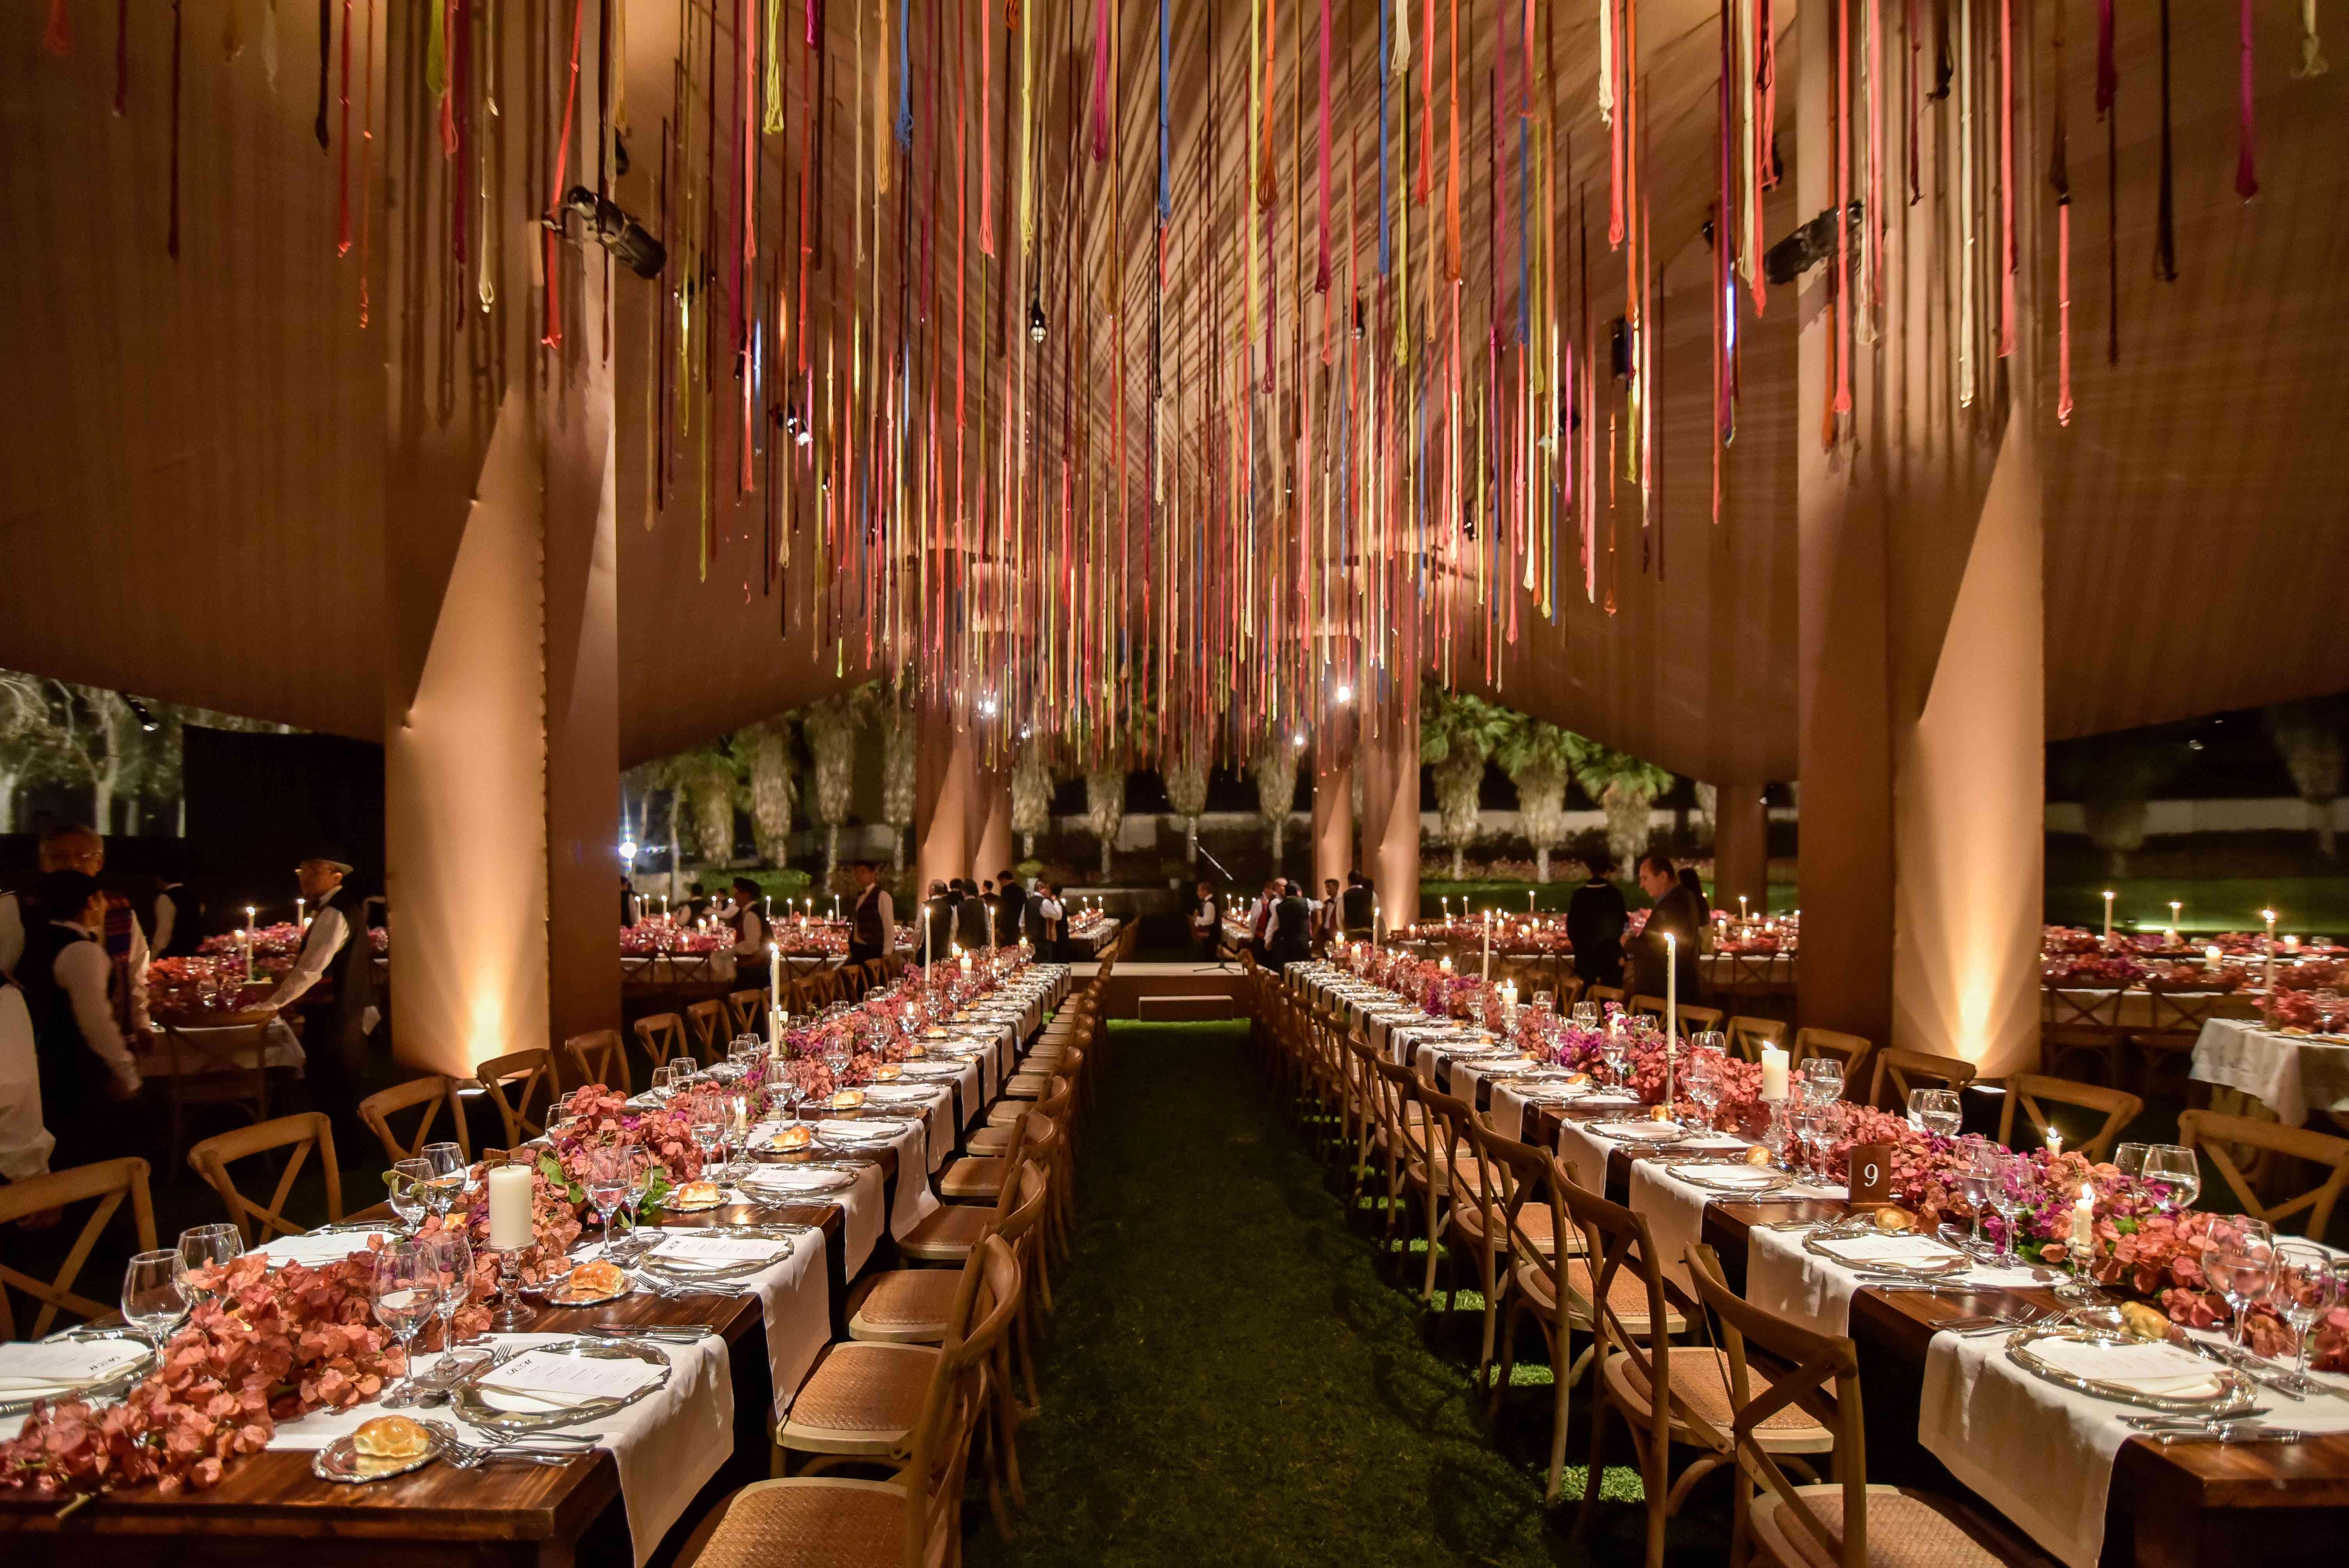 <p>Reception dinner decor</p><br><br>